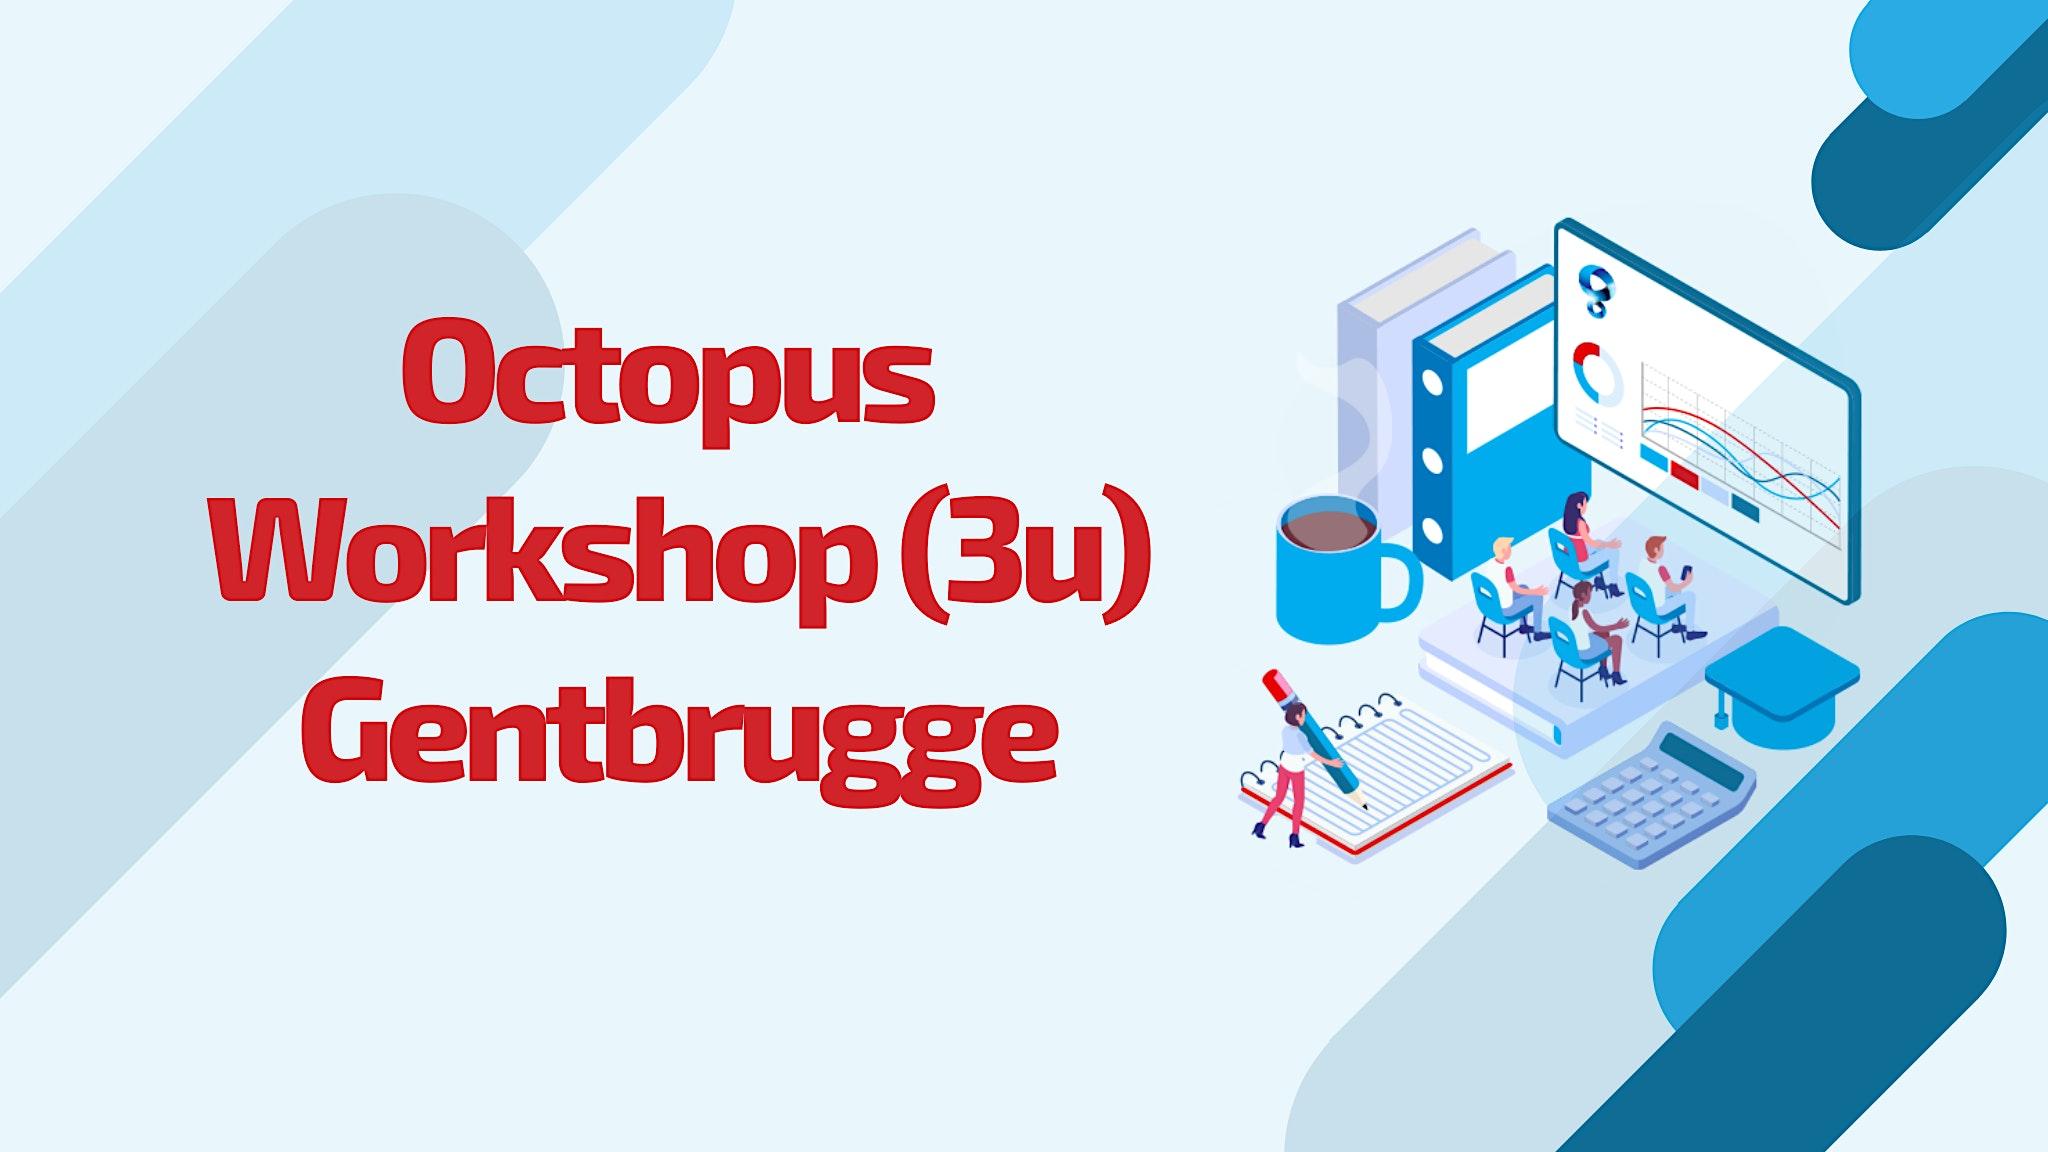 Octopus opleiding: Gentbrugge